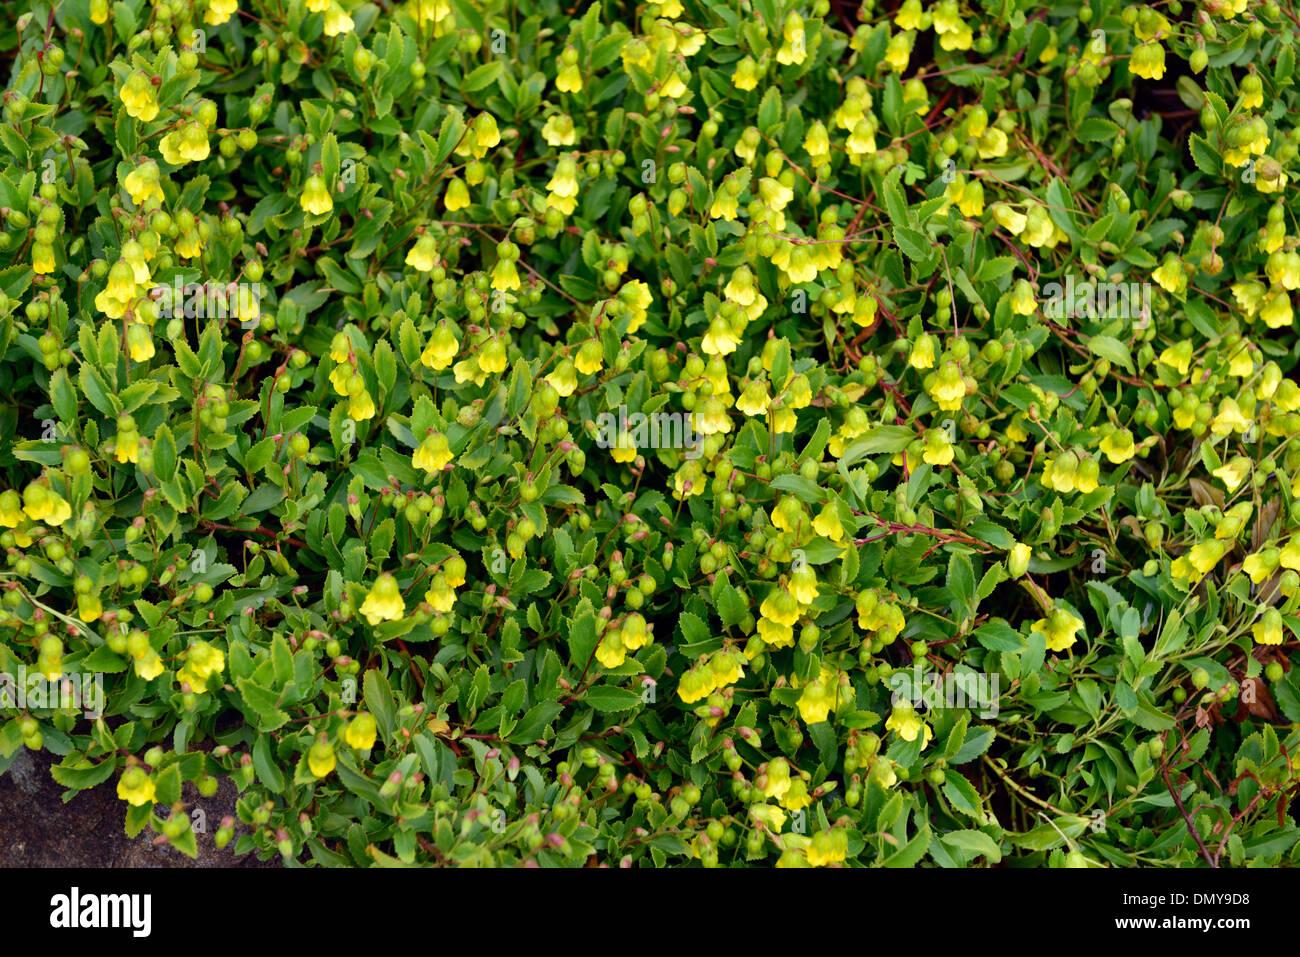 Yellow Flowering Shrub Stock Photos Yellow Flowering Shrub Stock